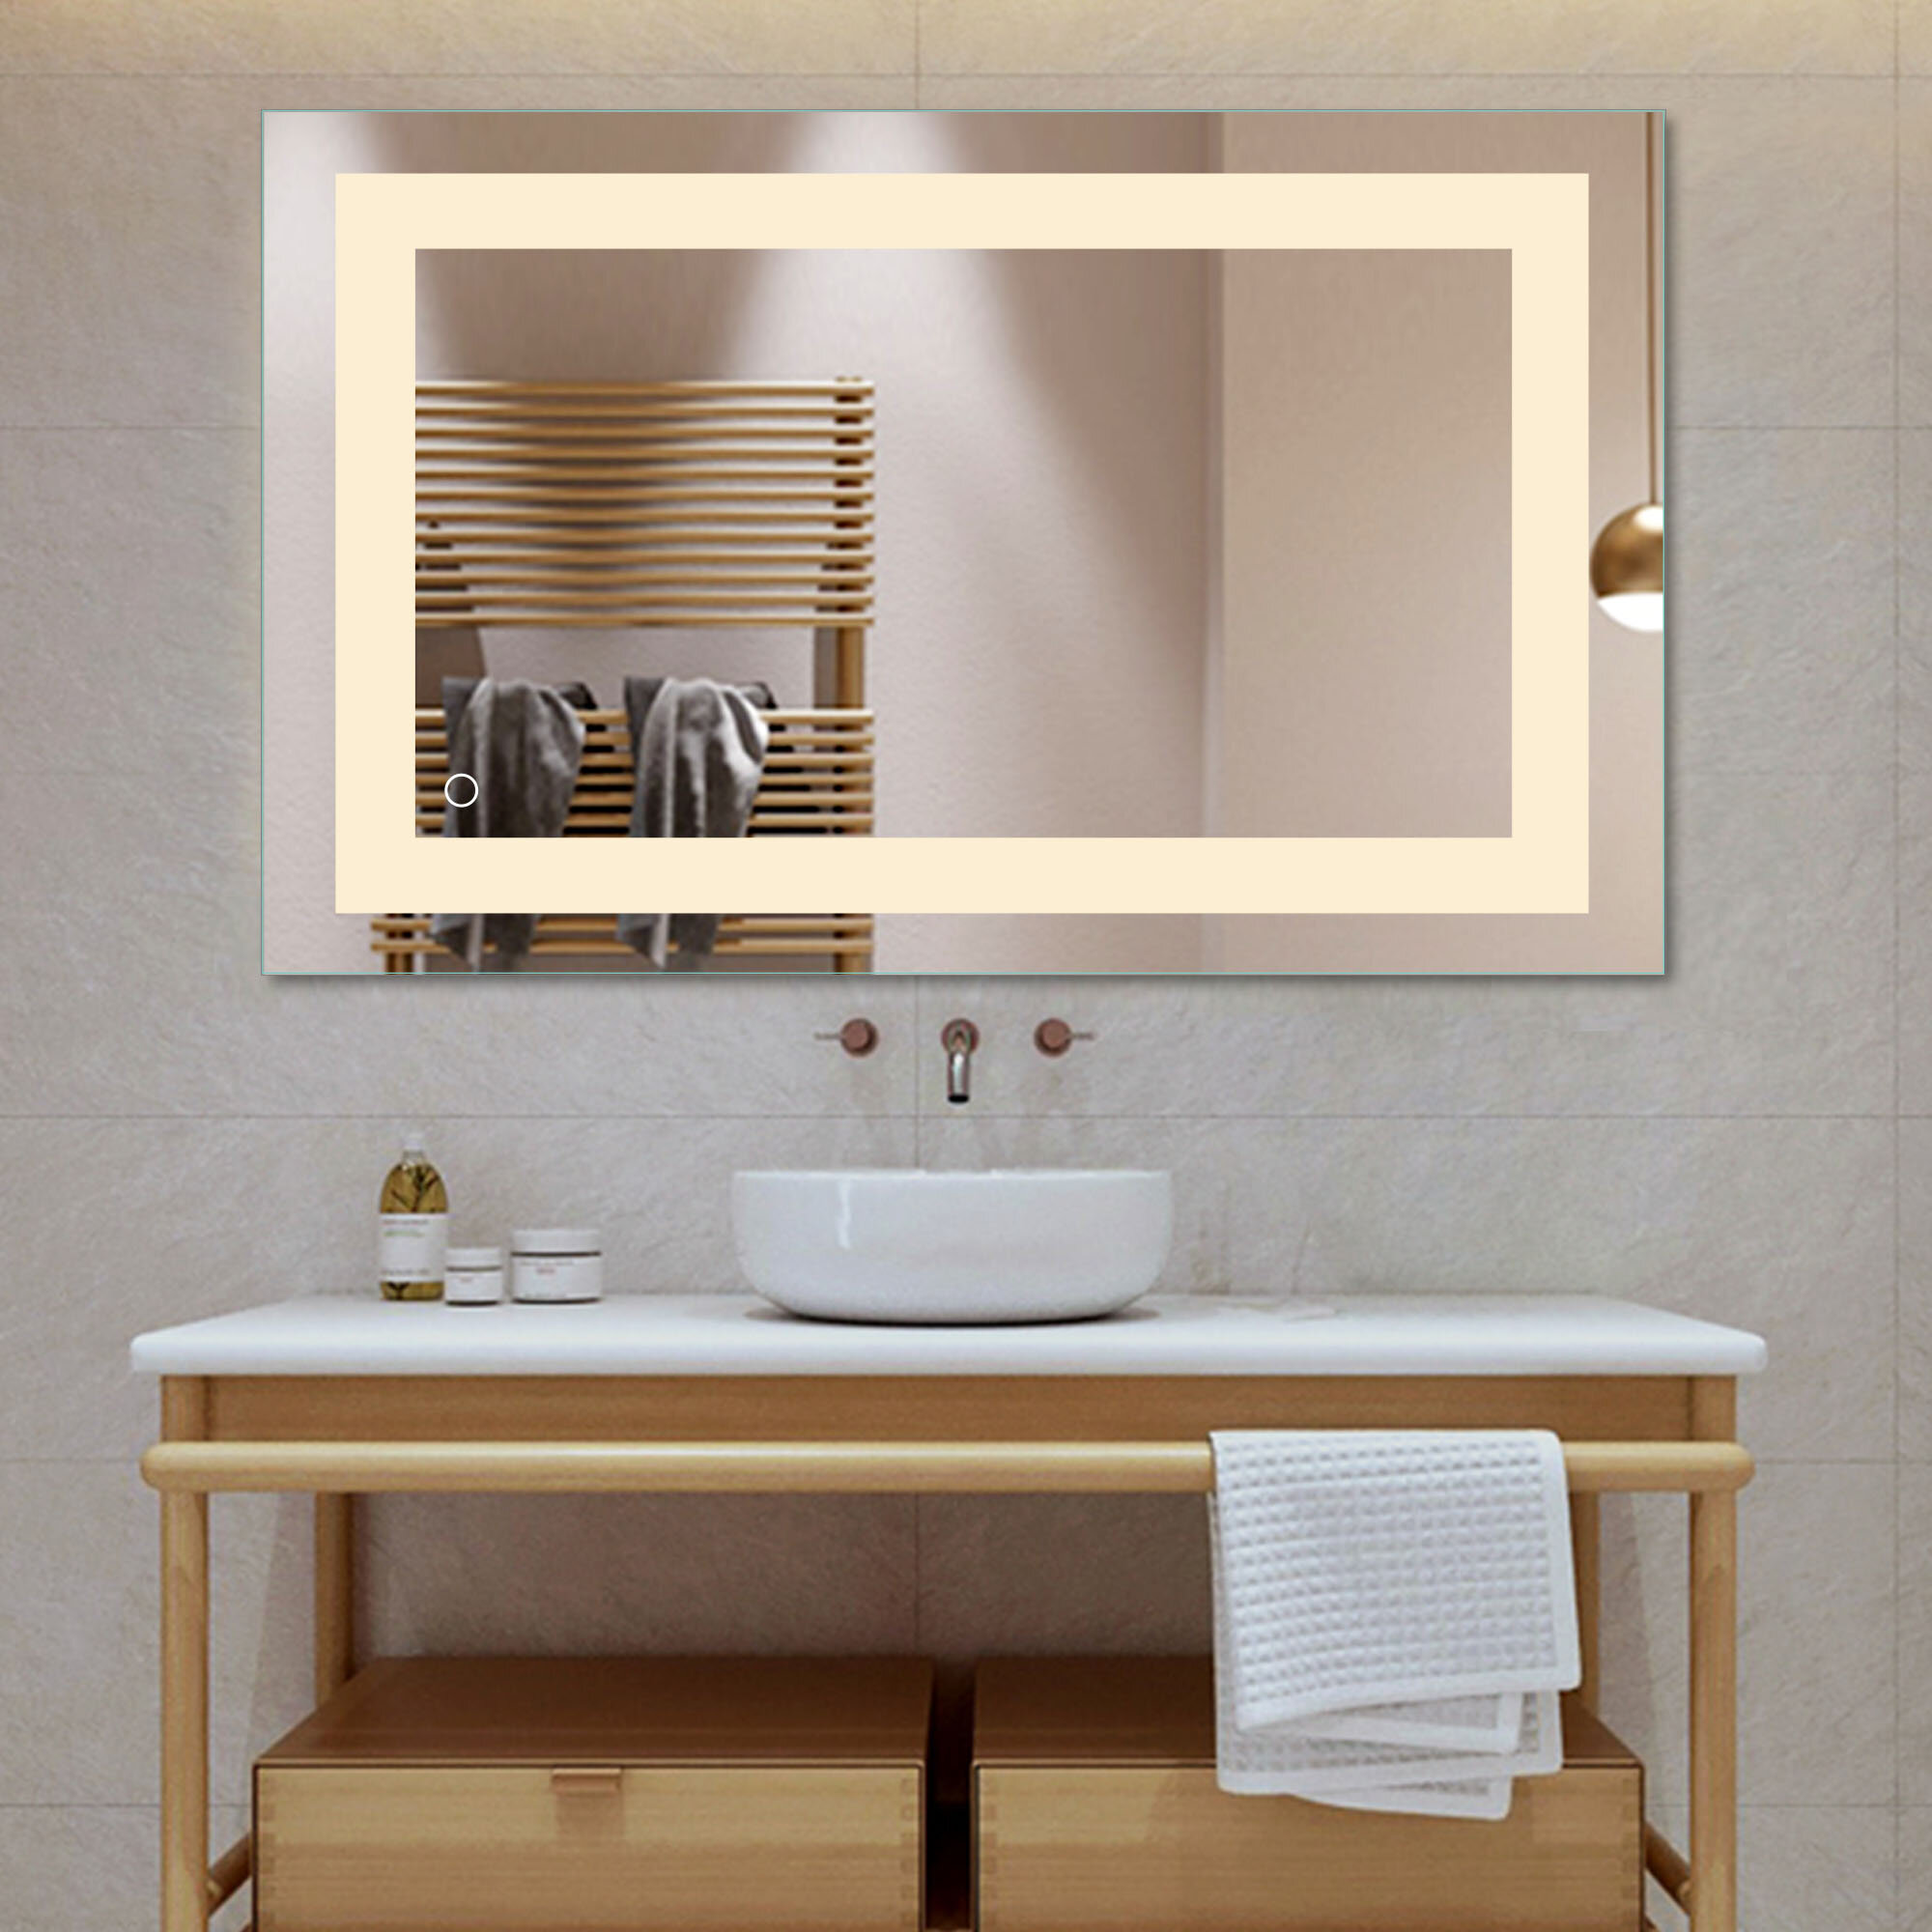 Orren Ellis Monaco Frameless Lighted Bathroom Vanity Mirror Reviews Wayfair